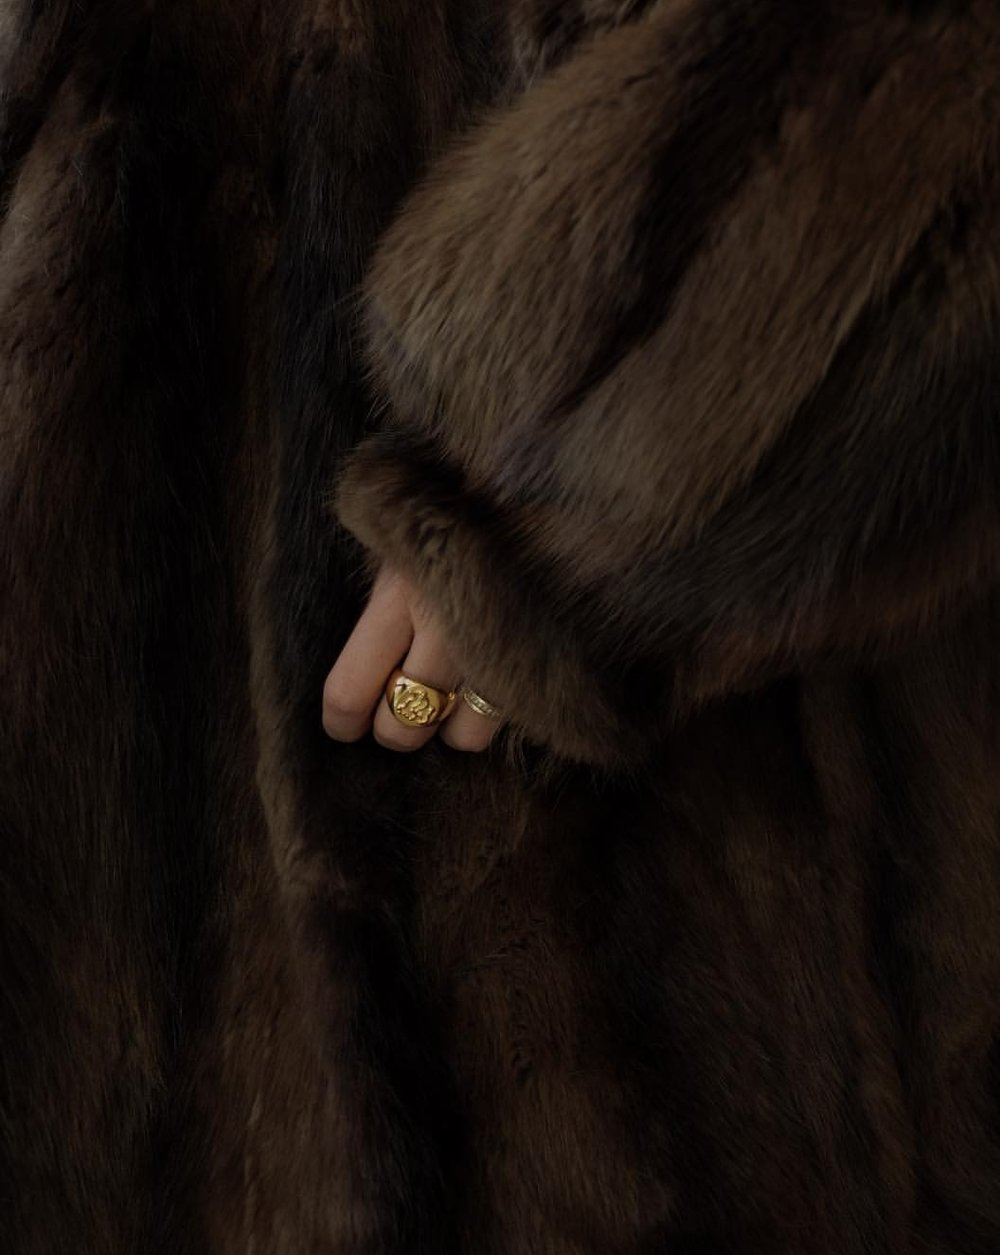 @gioiagiustino - Wearing Diploria Unisex Signet Ring.